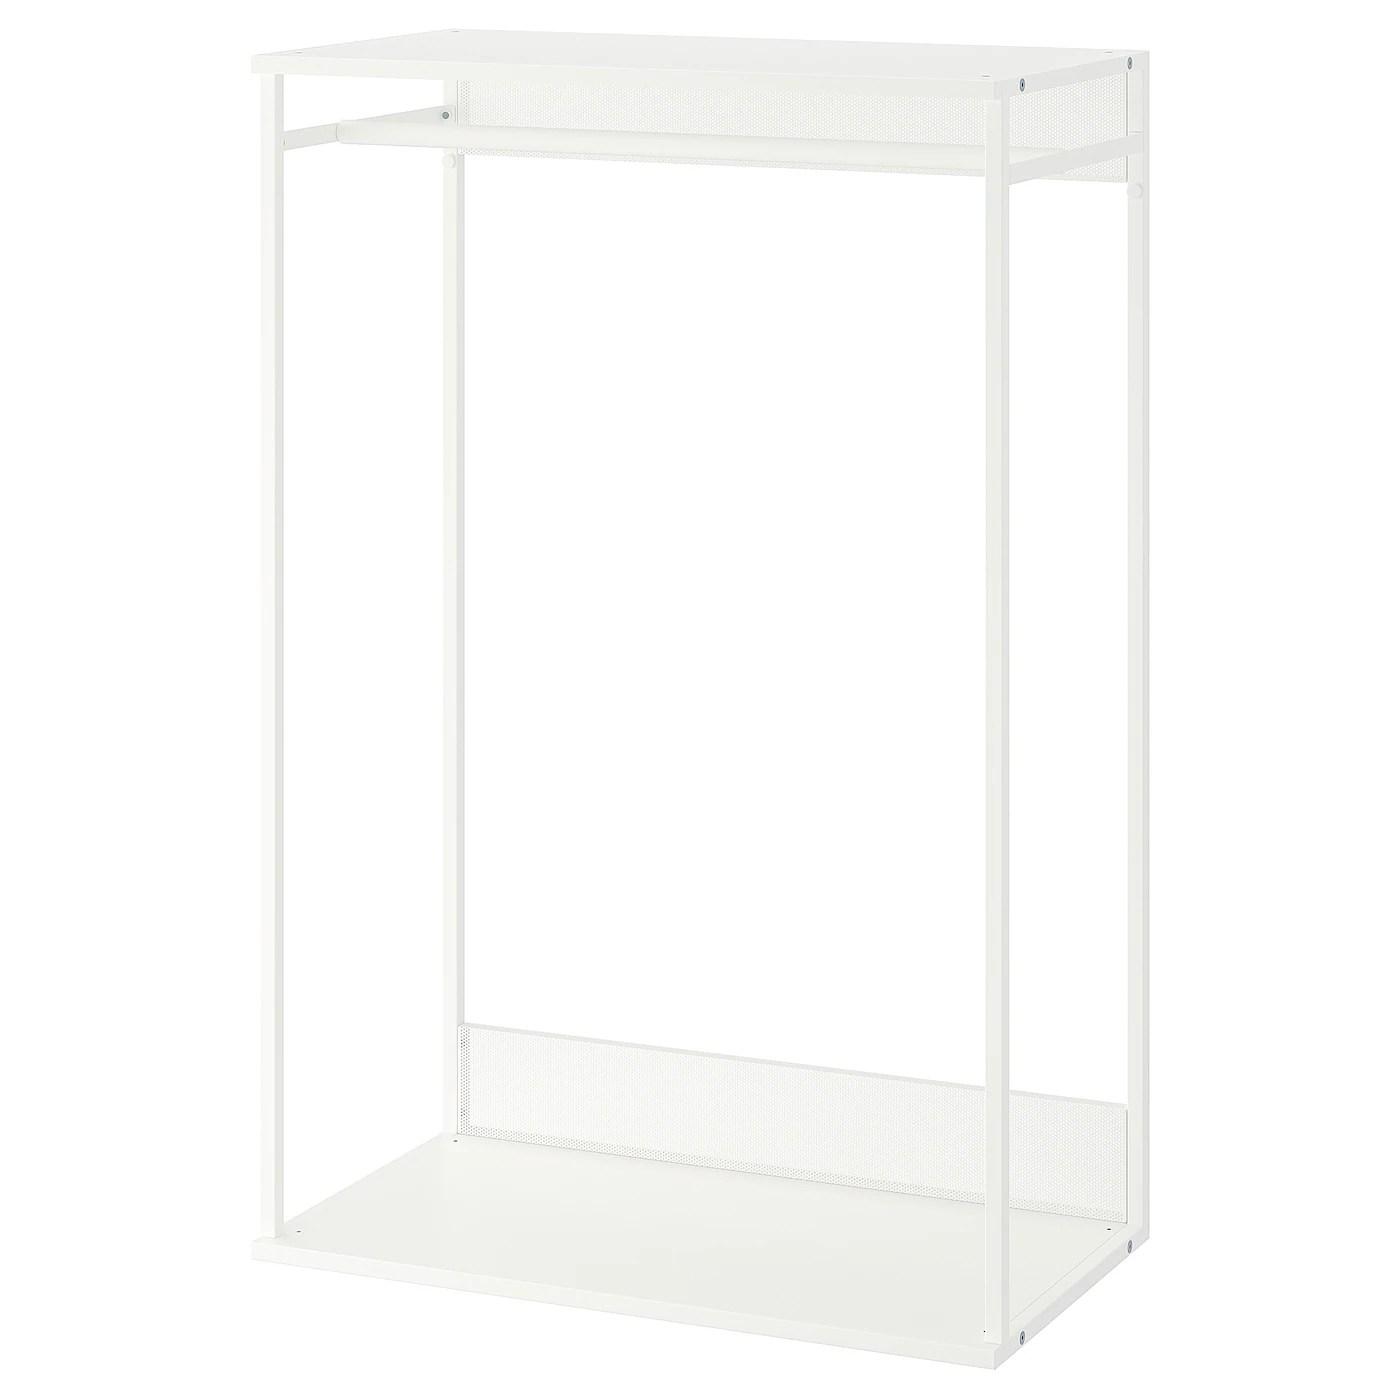 Platsa Aben Opbevaring Til Toj Pa Bojler Hvid Ikea